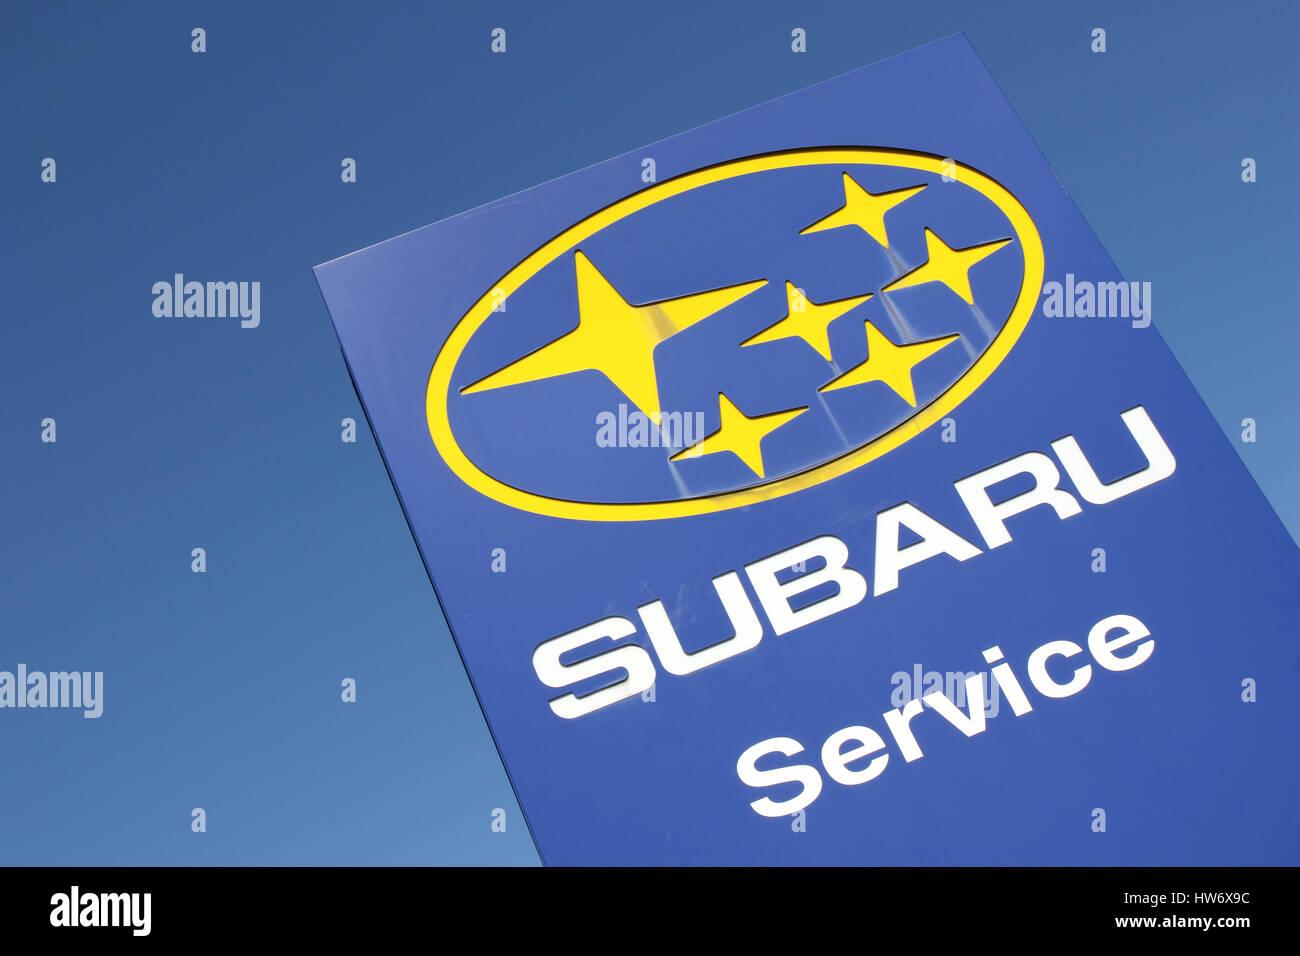 Subaru Dealership Sign Against Blue Sky Stock Photo 135991336 Alamy